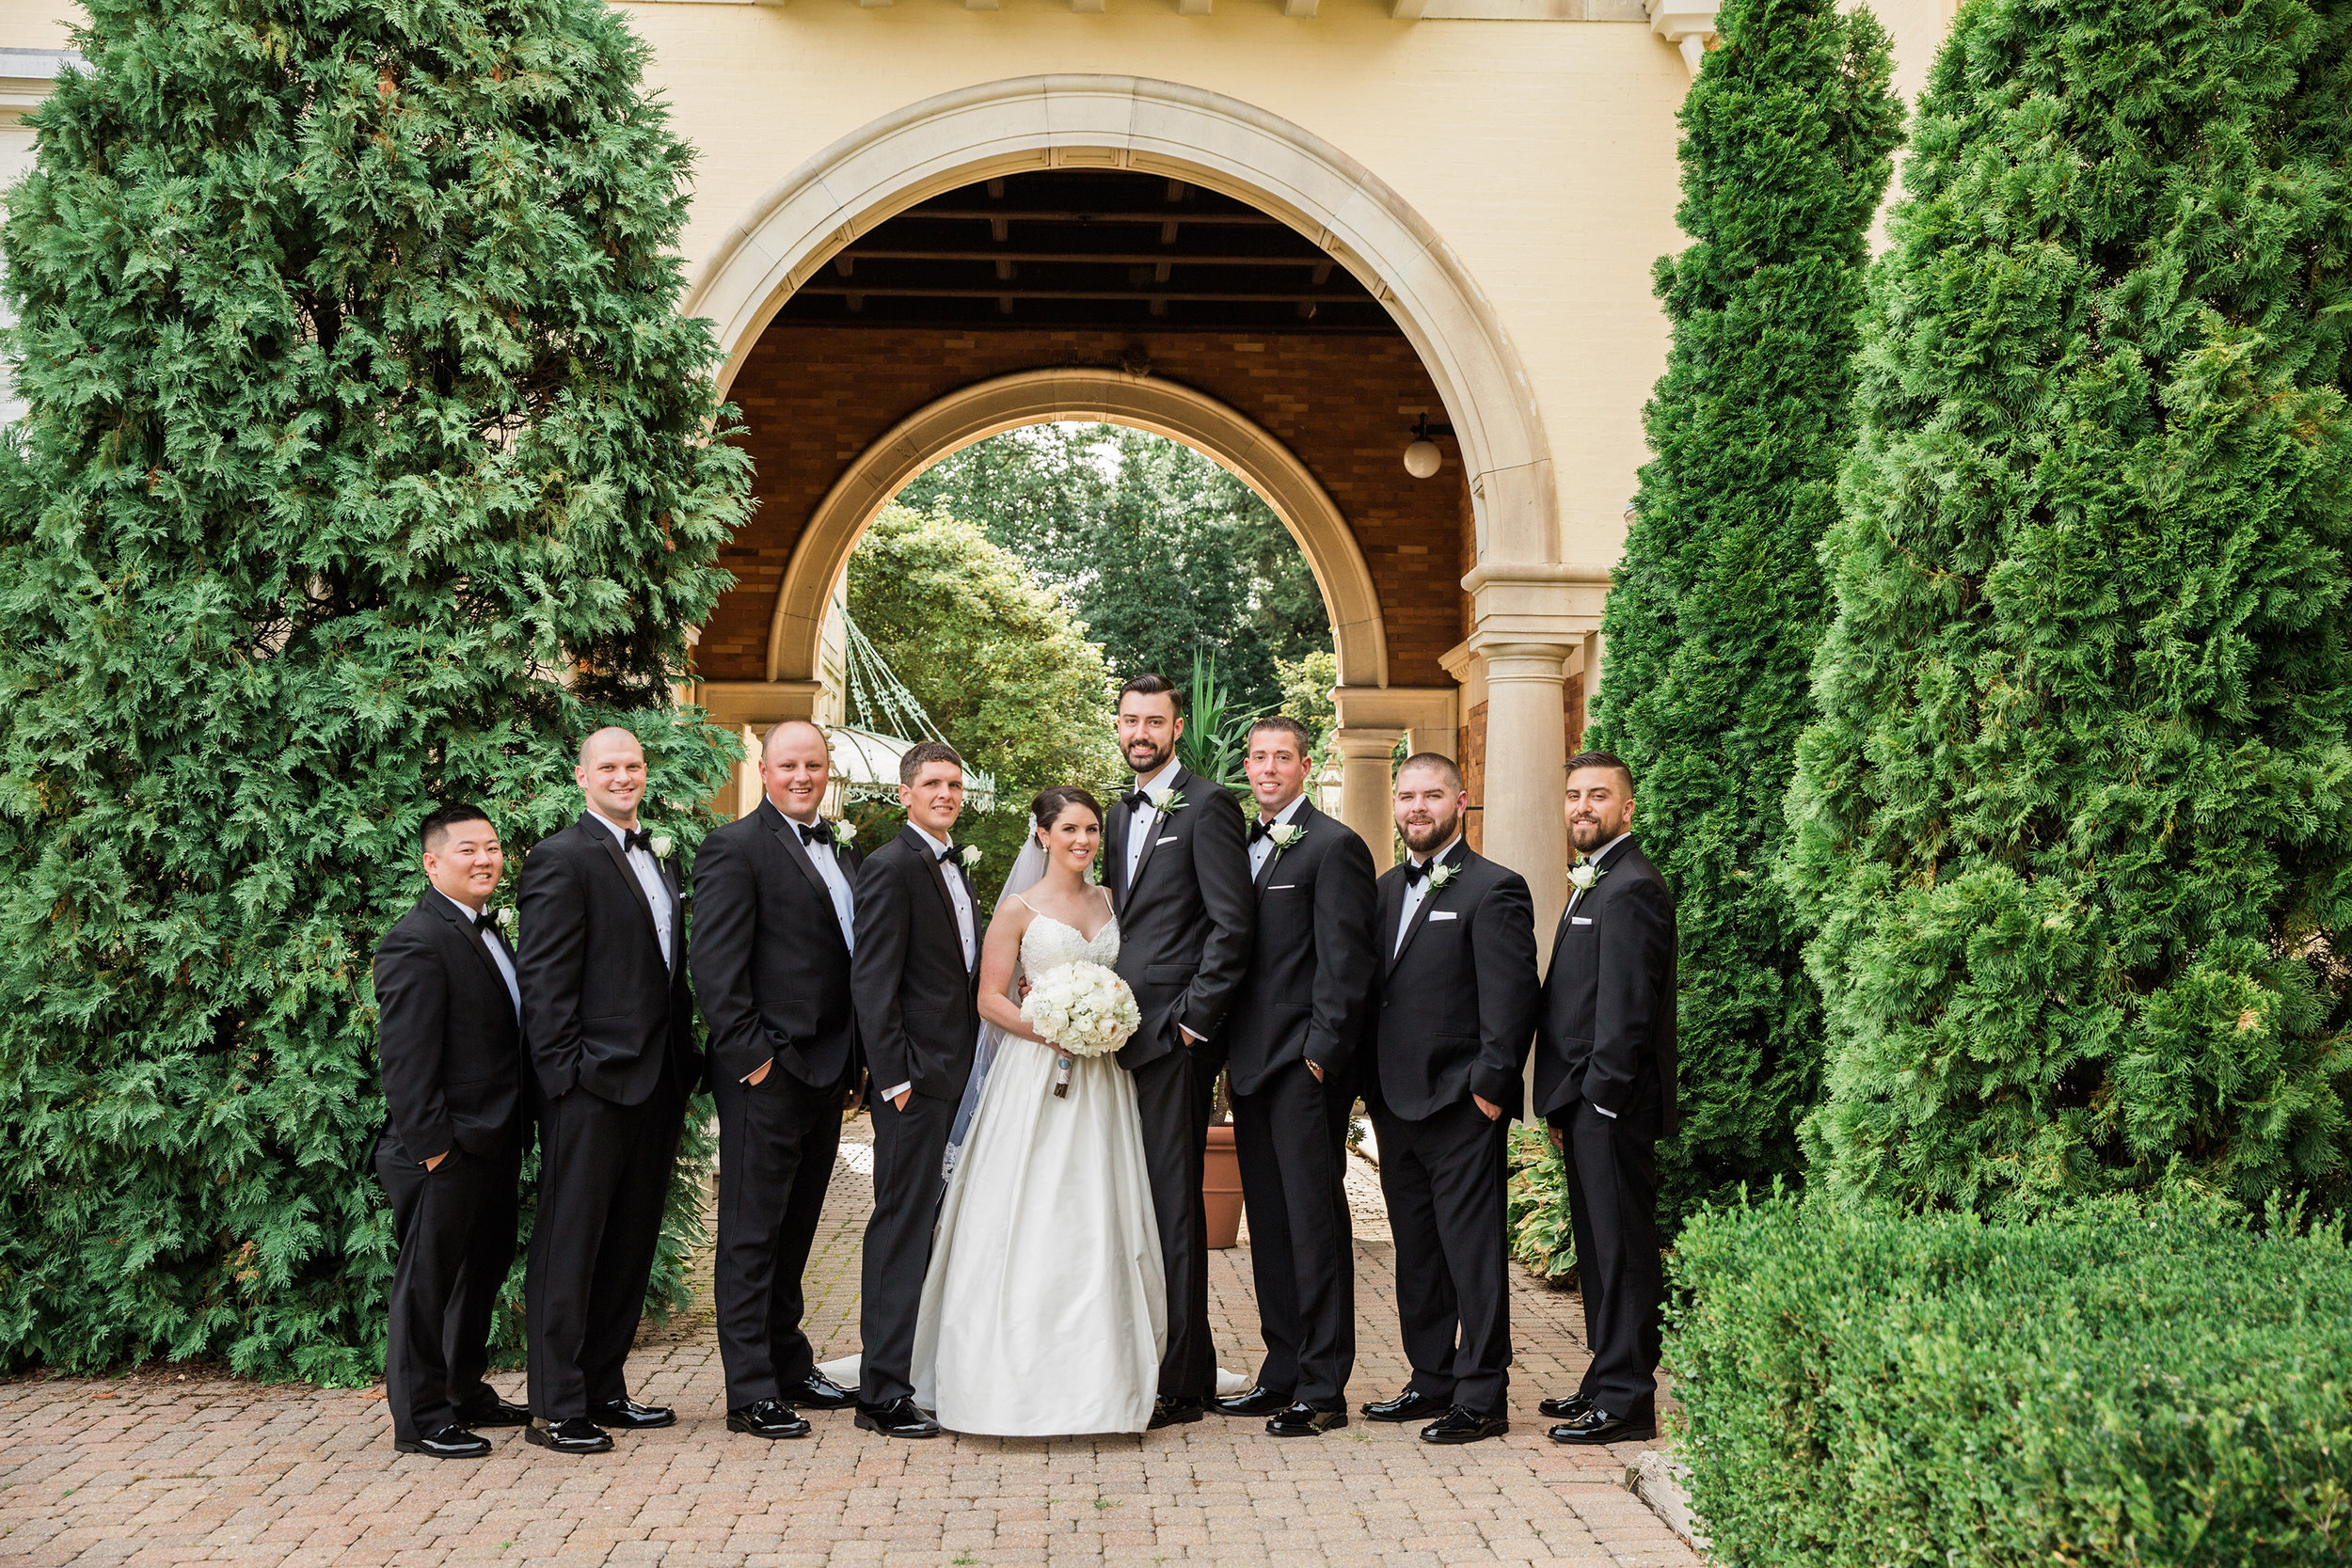 Evergreen-Museum-Balitmore-Maryland-Wedding-Black-Tie-Bride-025.jpg